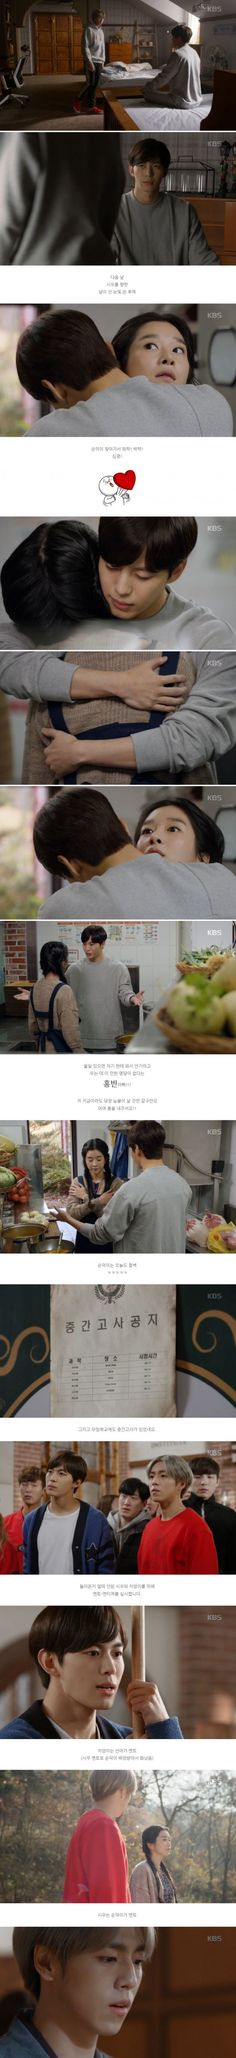 Added episode 5 captures for the Korean drama 'Moorim School'.